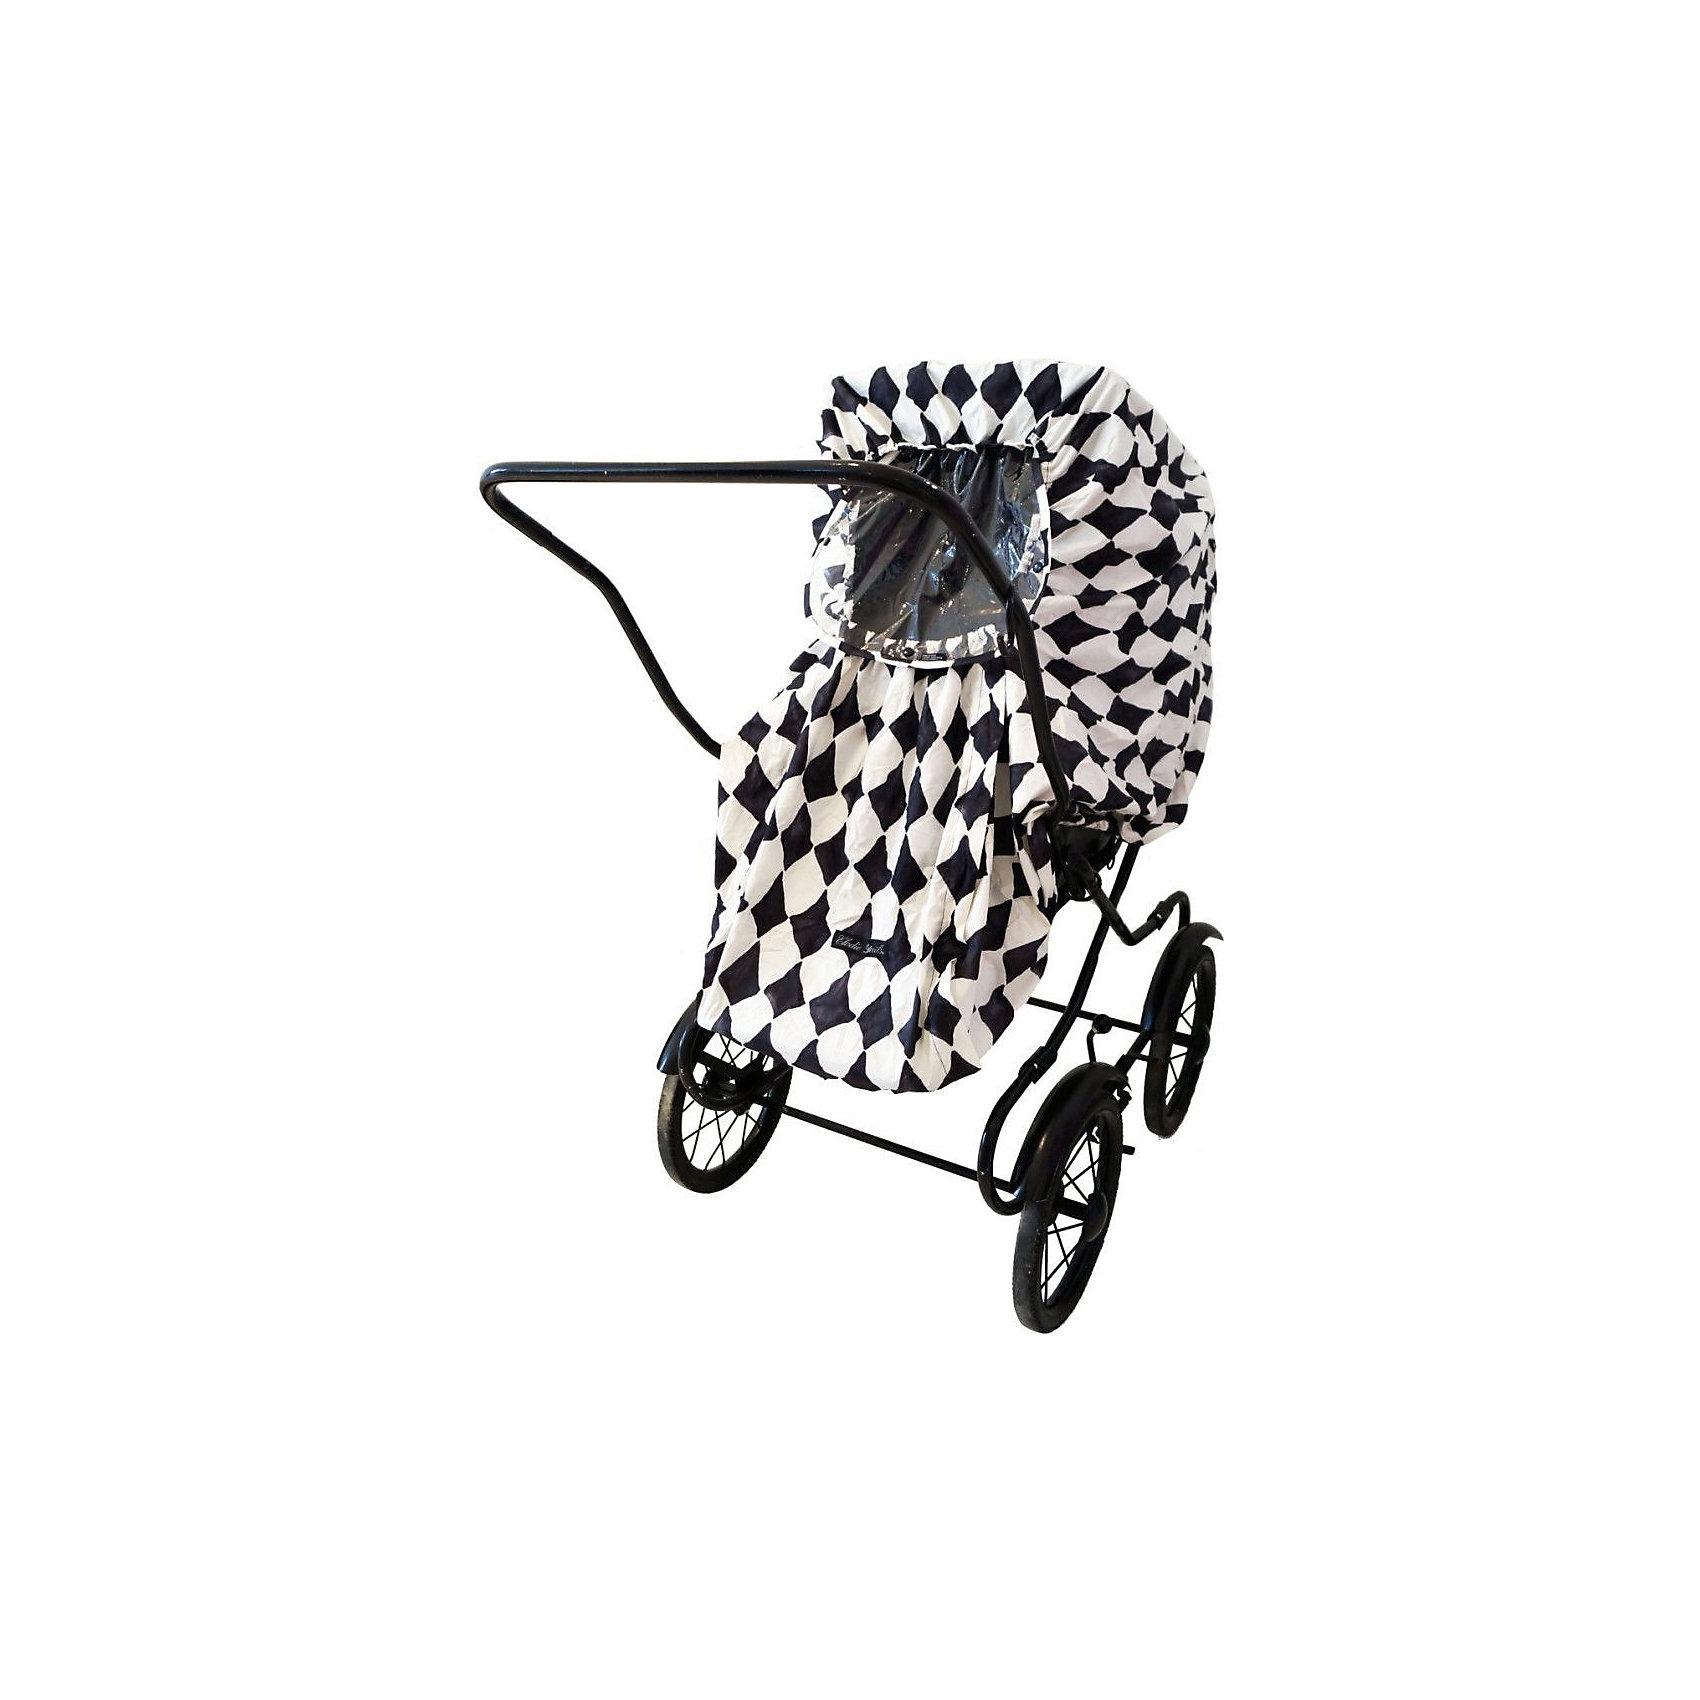 Дождевик для коляски Graphic Grace, Elodie Details